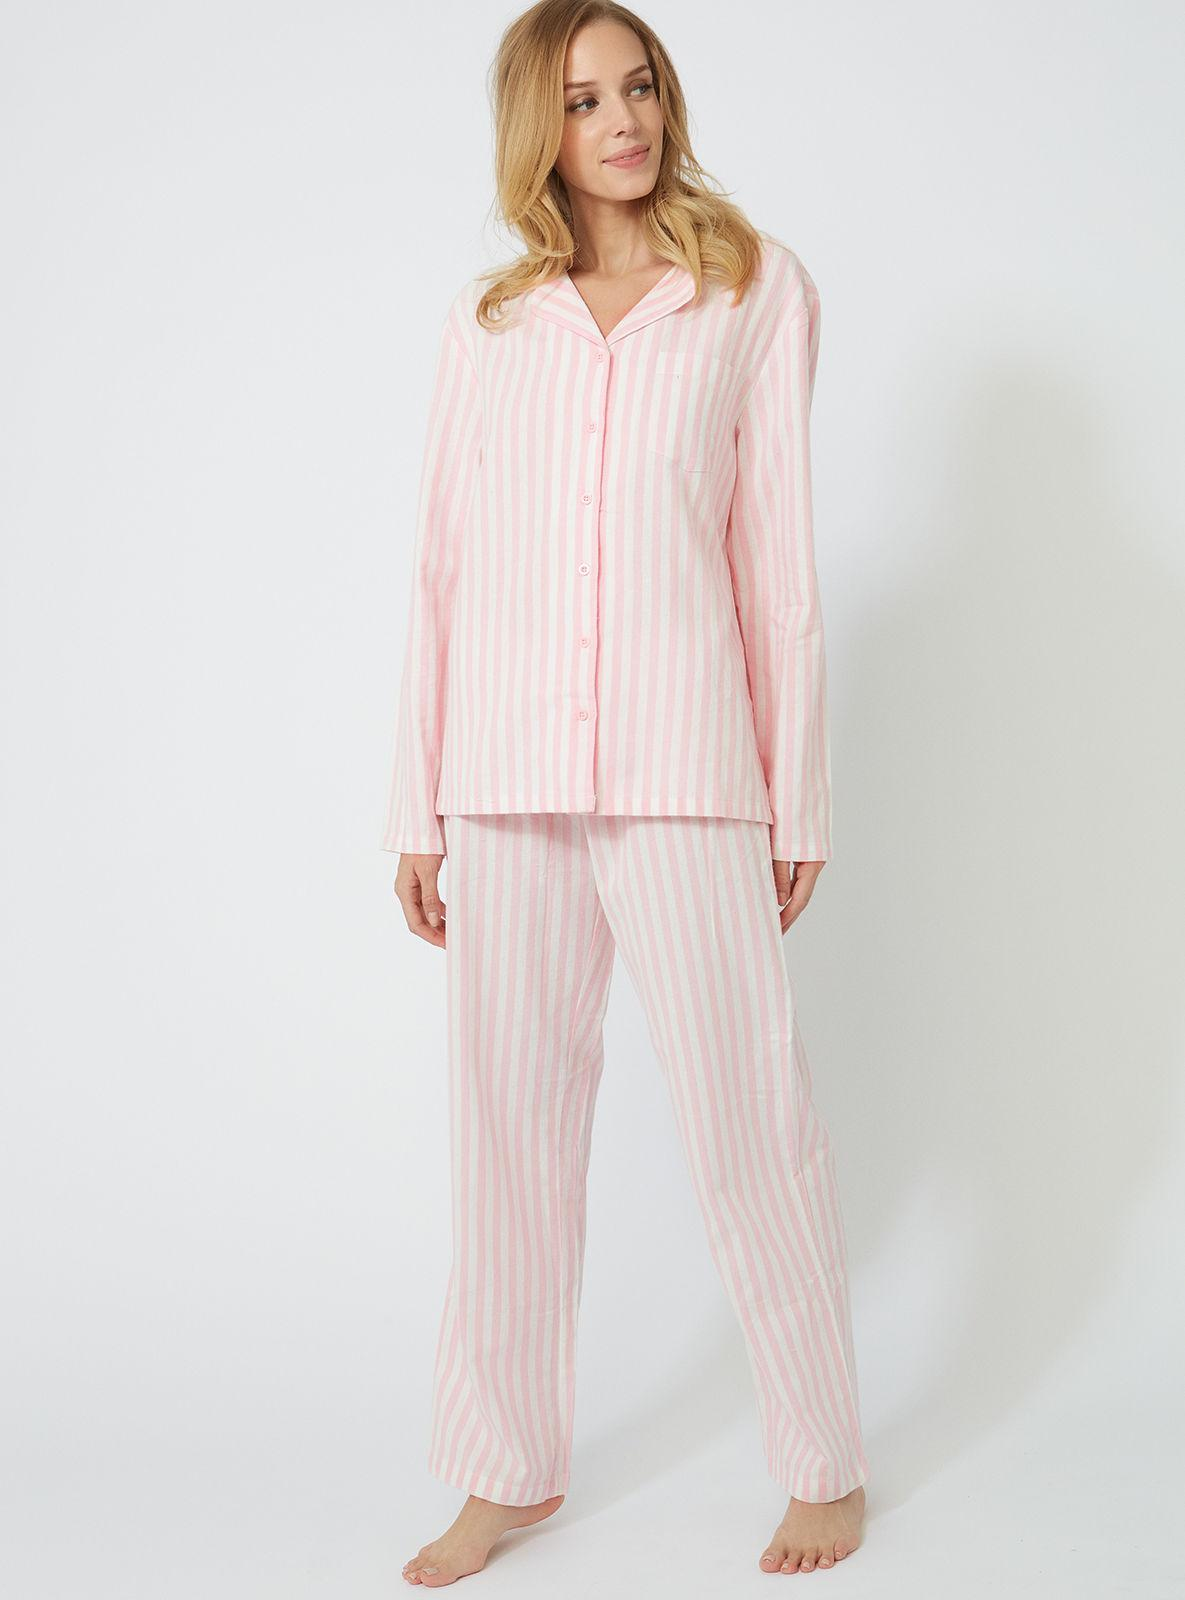 Lyst - Boux Avenue Stripe Pjs In A Bag in Pink 567772ac1